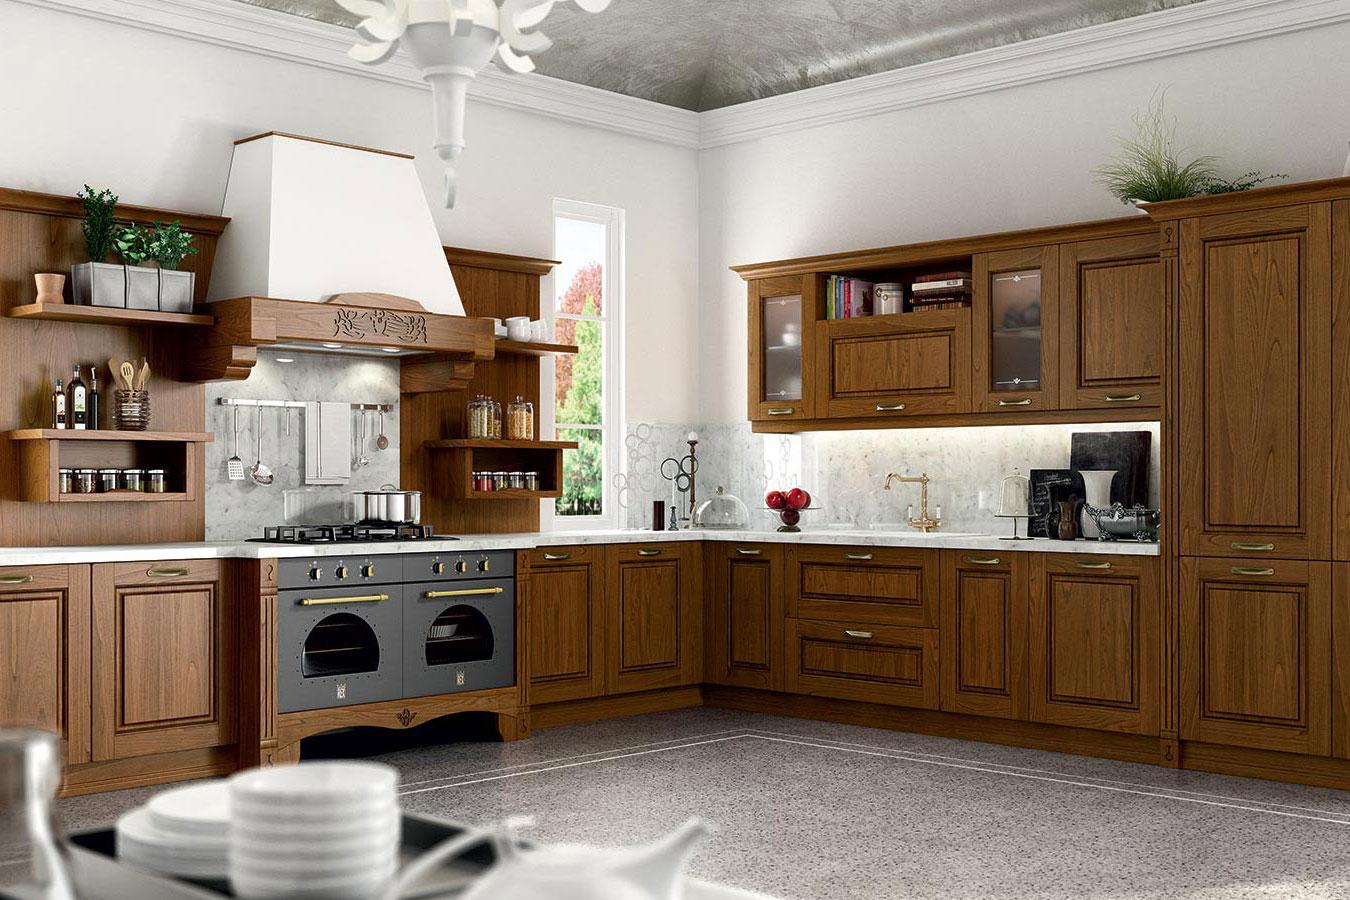 Cucina classica Verona di Arredo3 da righetti mobili a Novara Piemonte